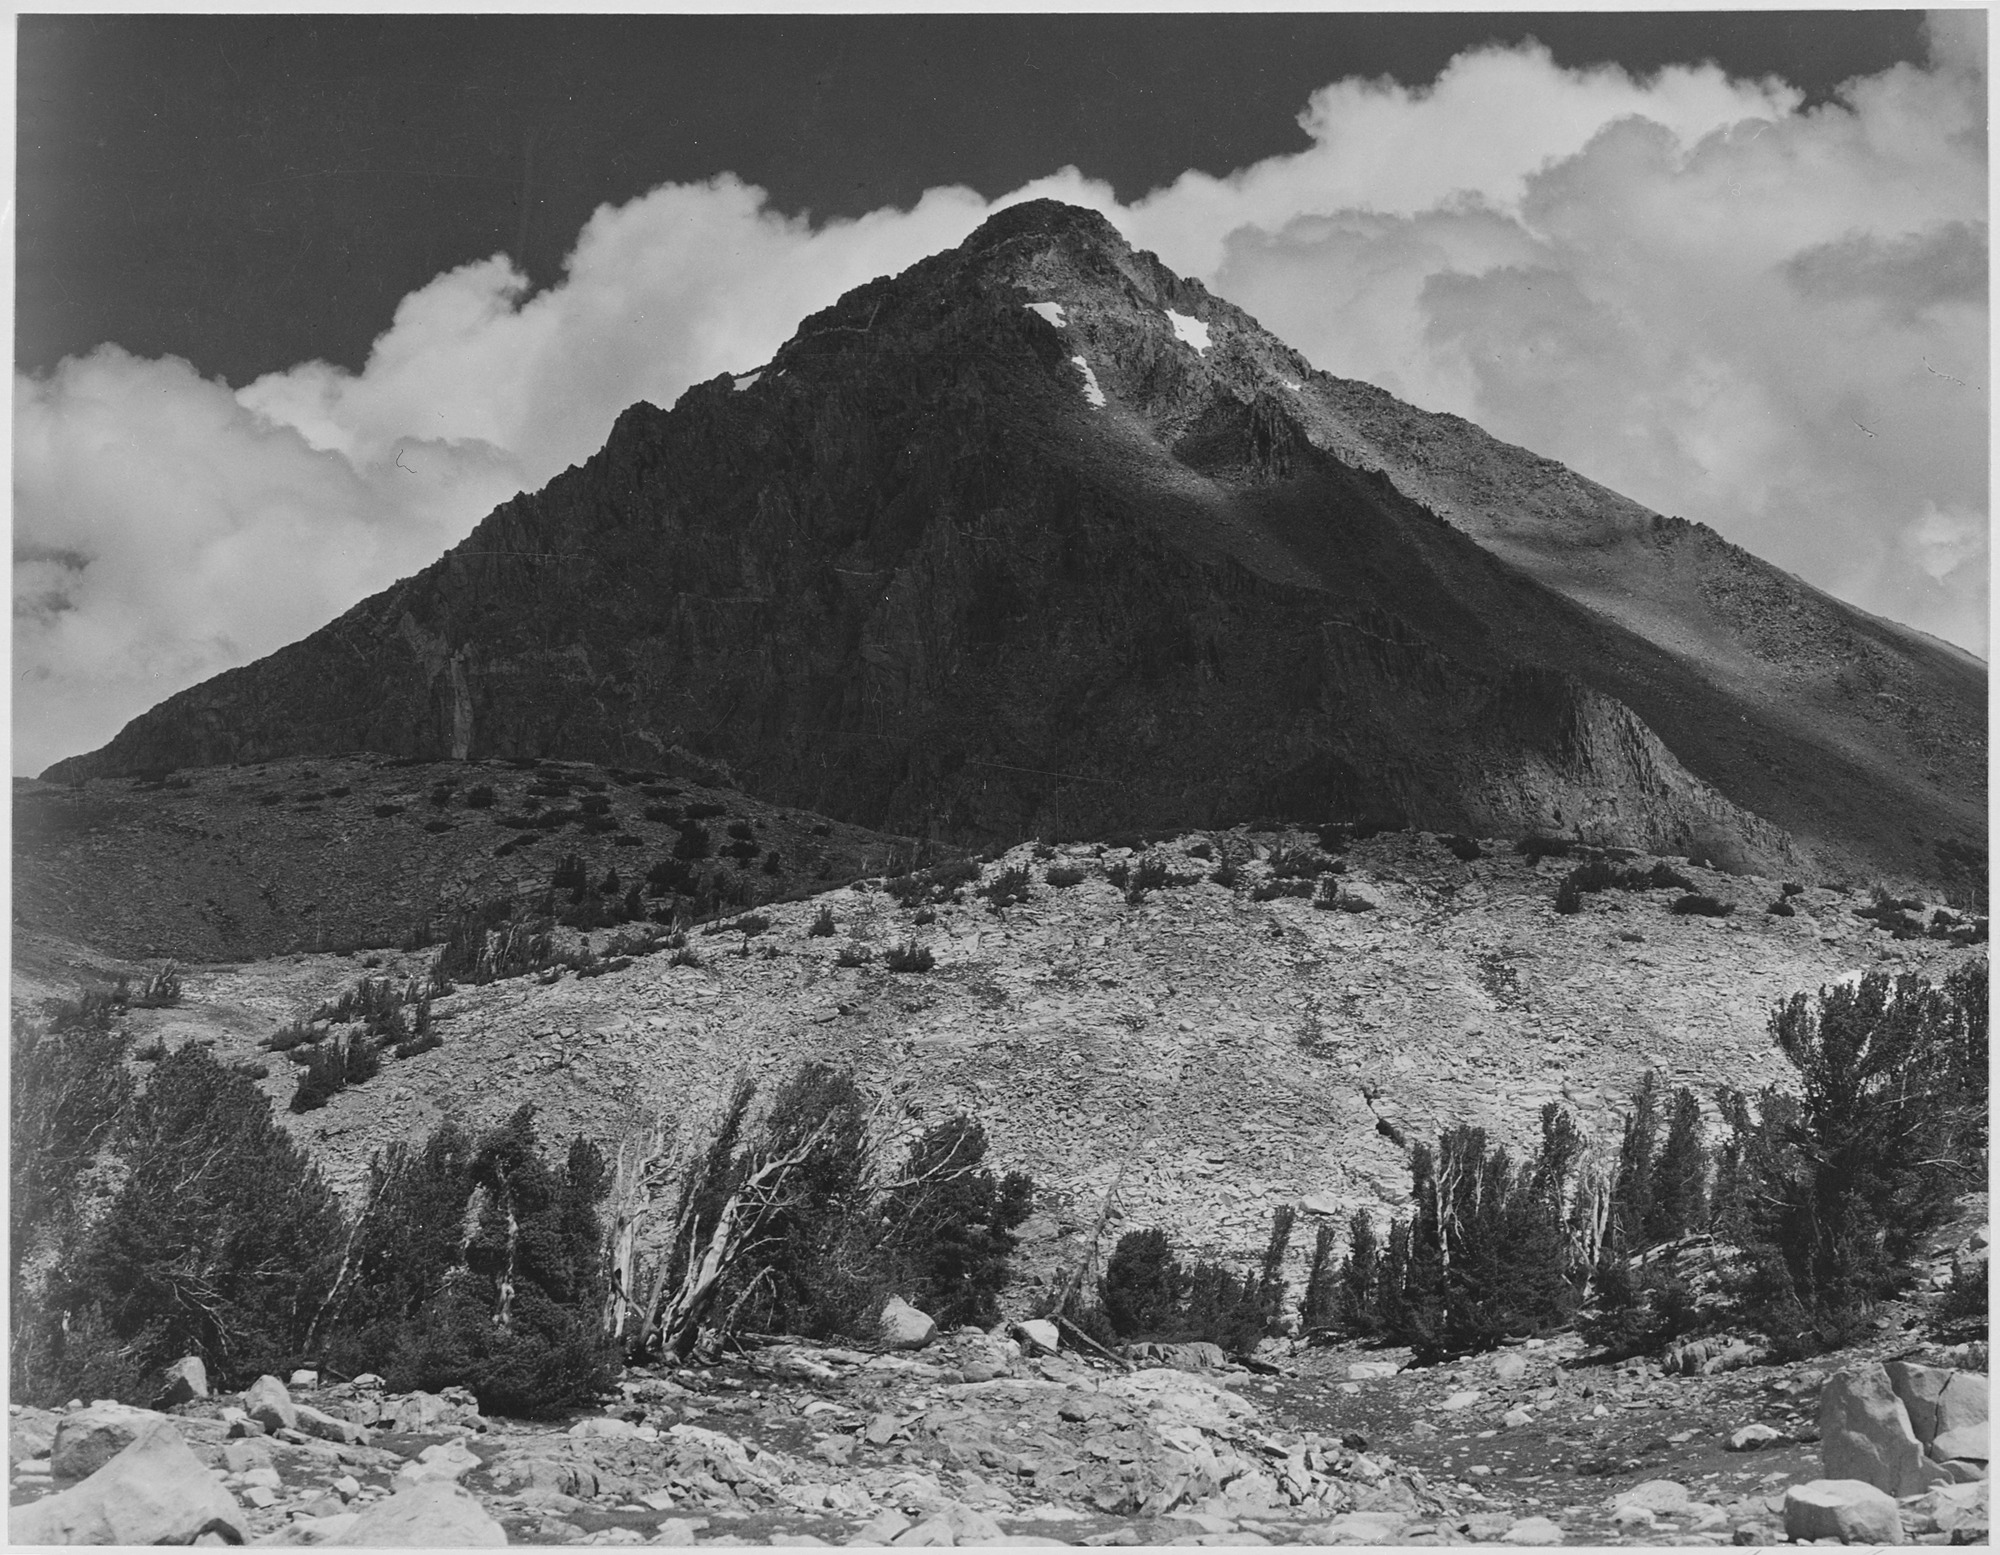 -Pinchot_Pass,_Mt._Wynne,_Kings_River_Canyon_(Proposed_as_a_national_park),-_California,_1936.,_ca._1936_-_NARA_-_519926.jpg